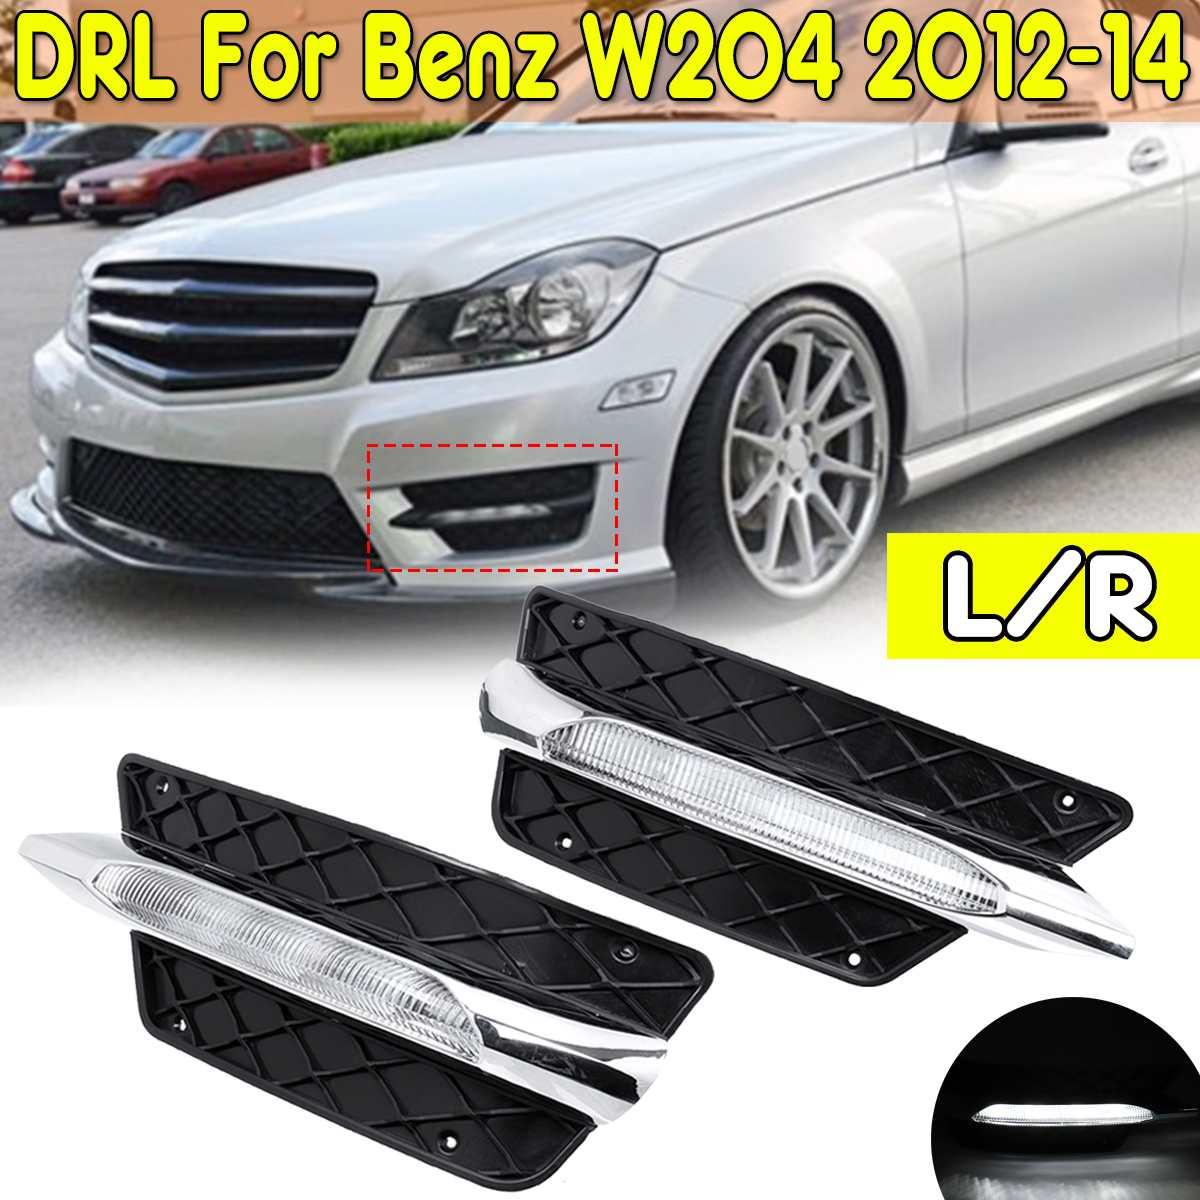 R/L Front Bumper Grill Molding LED Fog Light Daytime Running Light Fog Lamp For Mercedes For Benz W204 C Class 2012 14 DRL Only